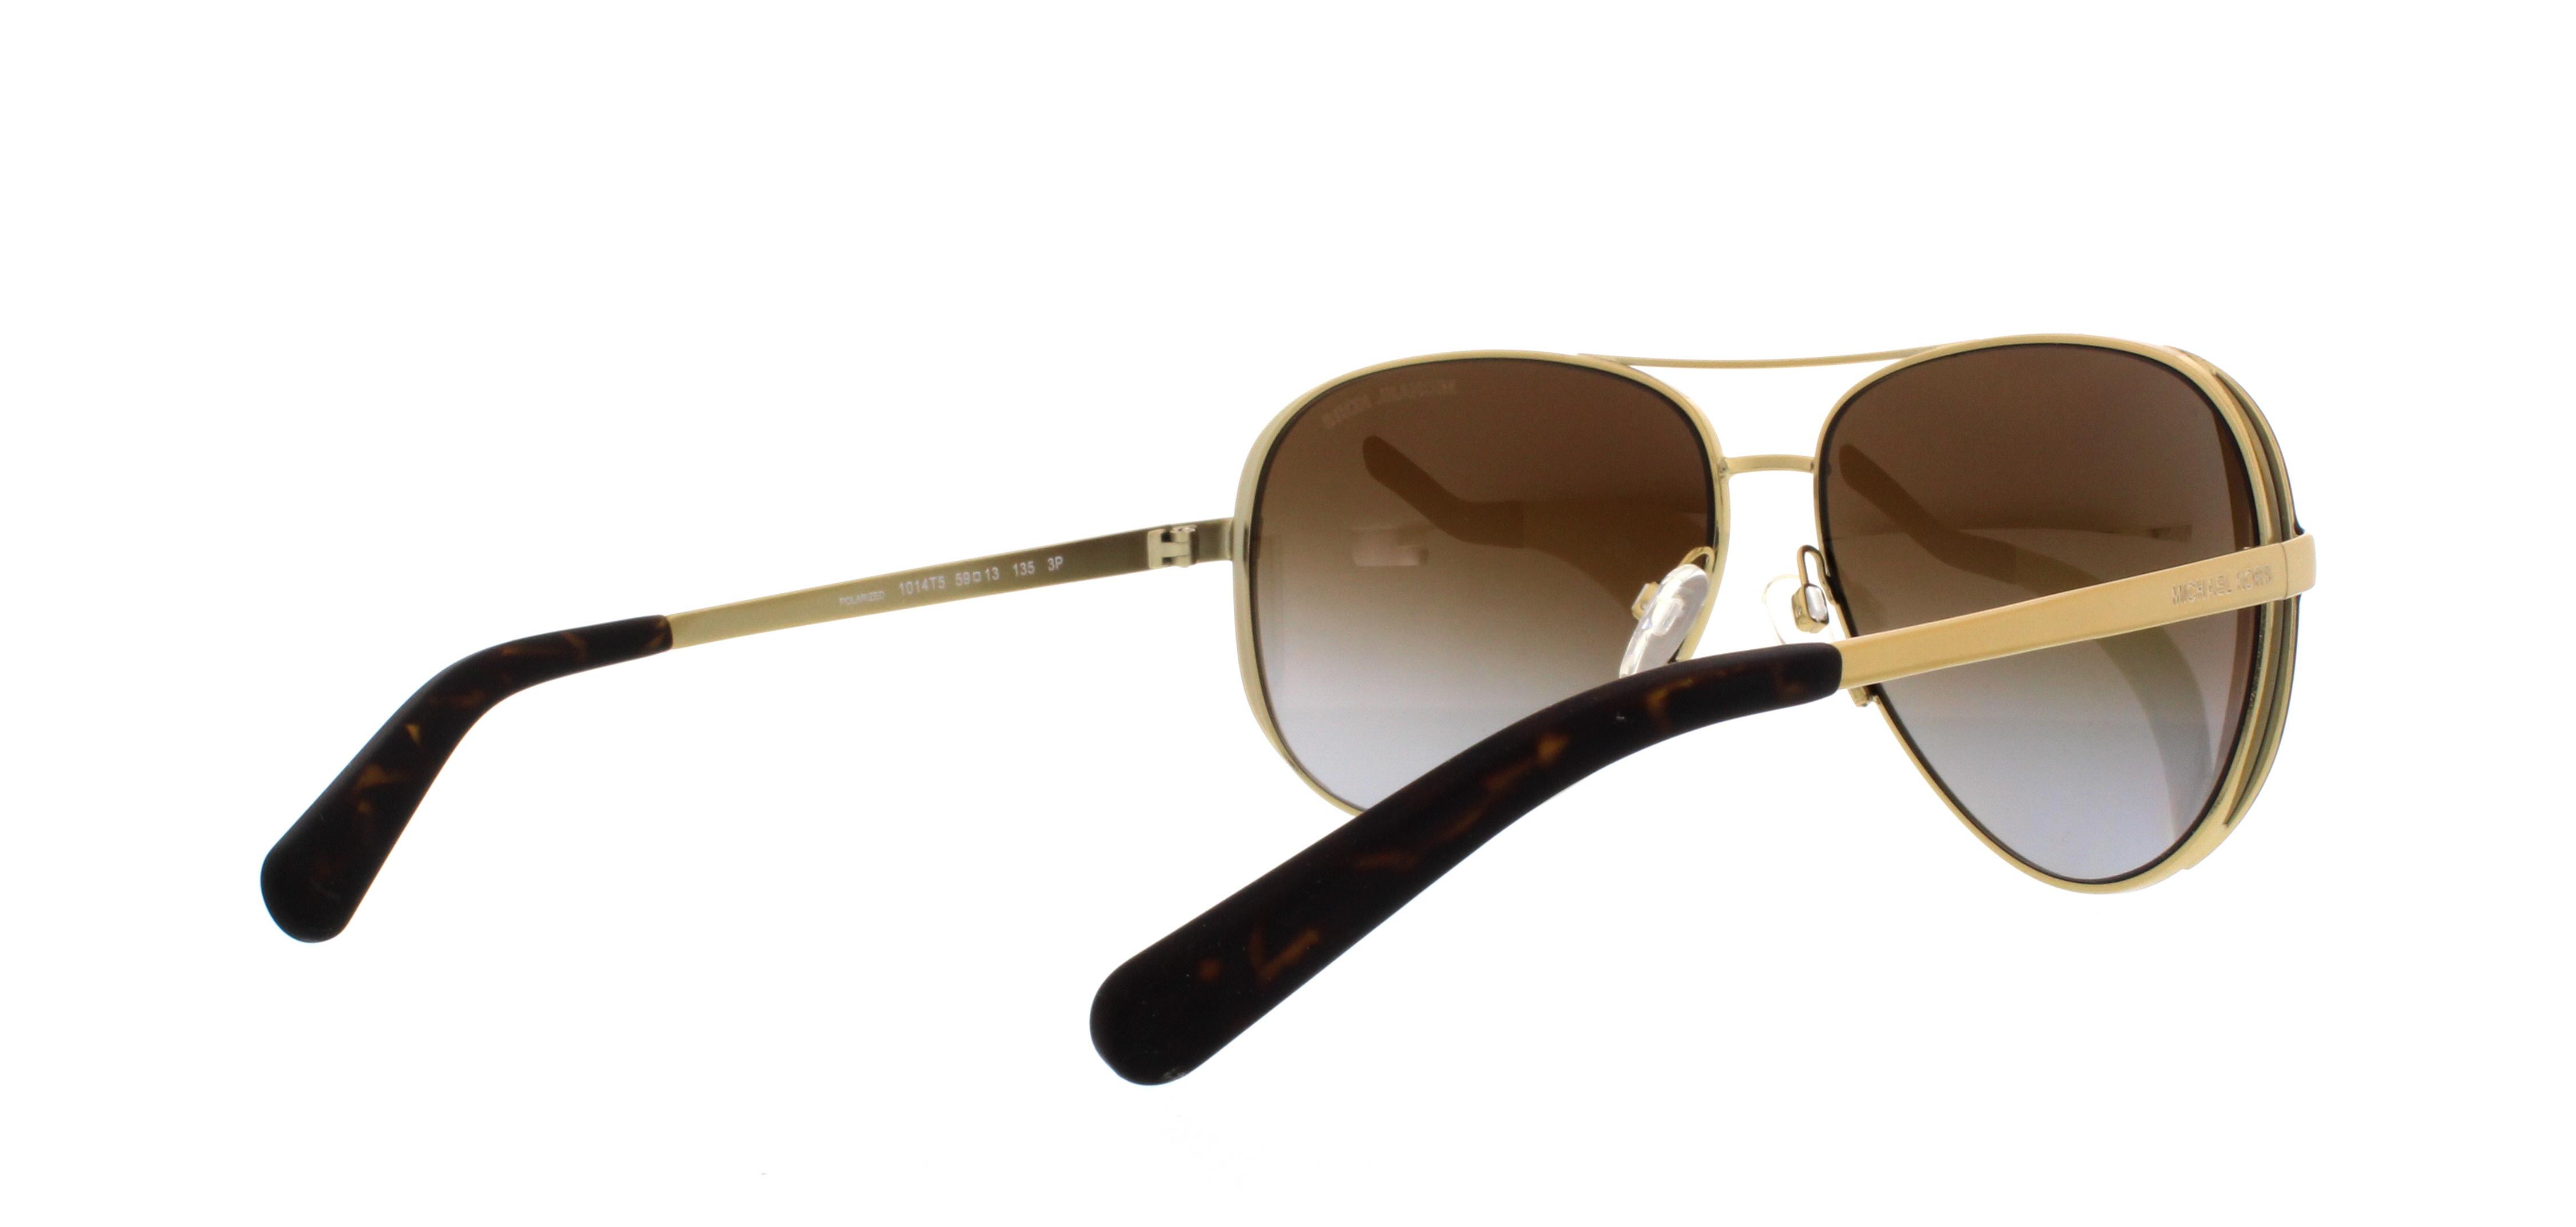 MICHAEL KORS Sunglasses MK5004 CHELSEA 1014T5 Gold Chocolate Brown ... 68a23d0c2b